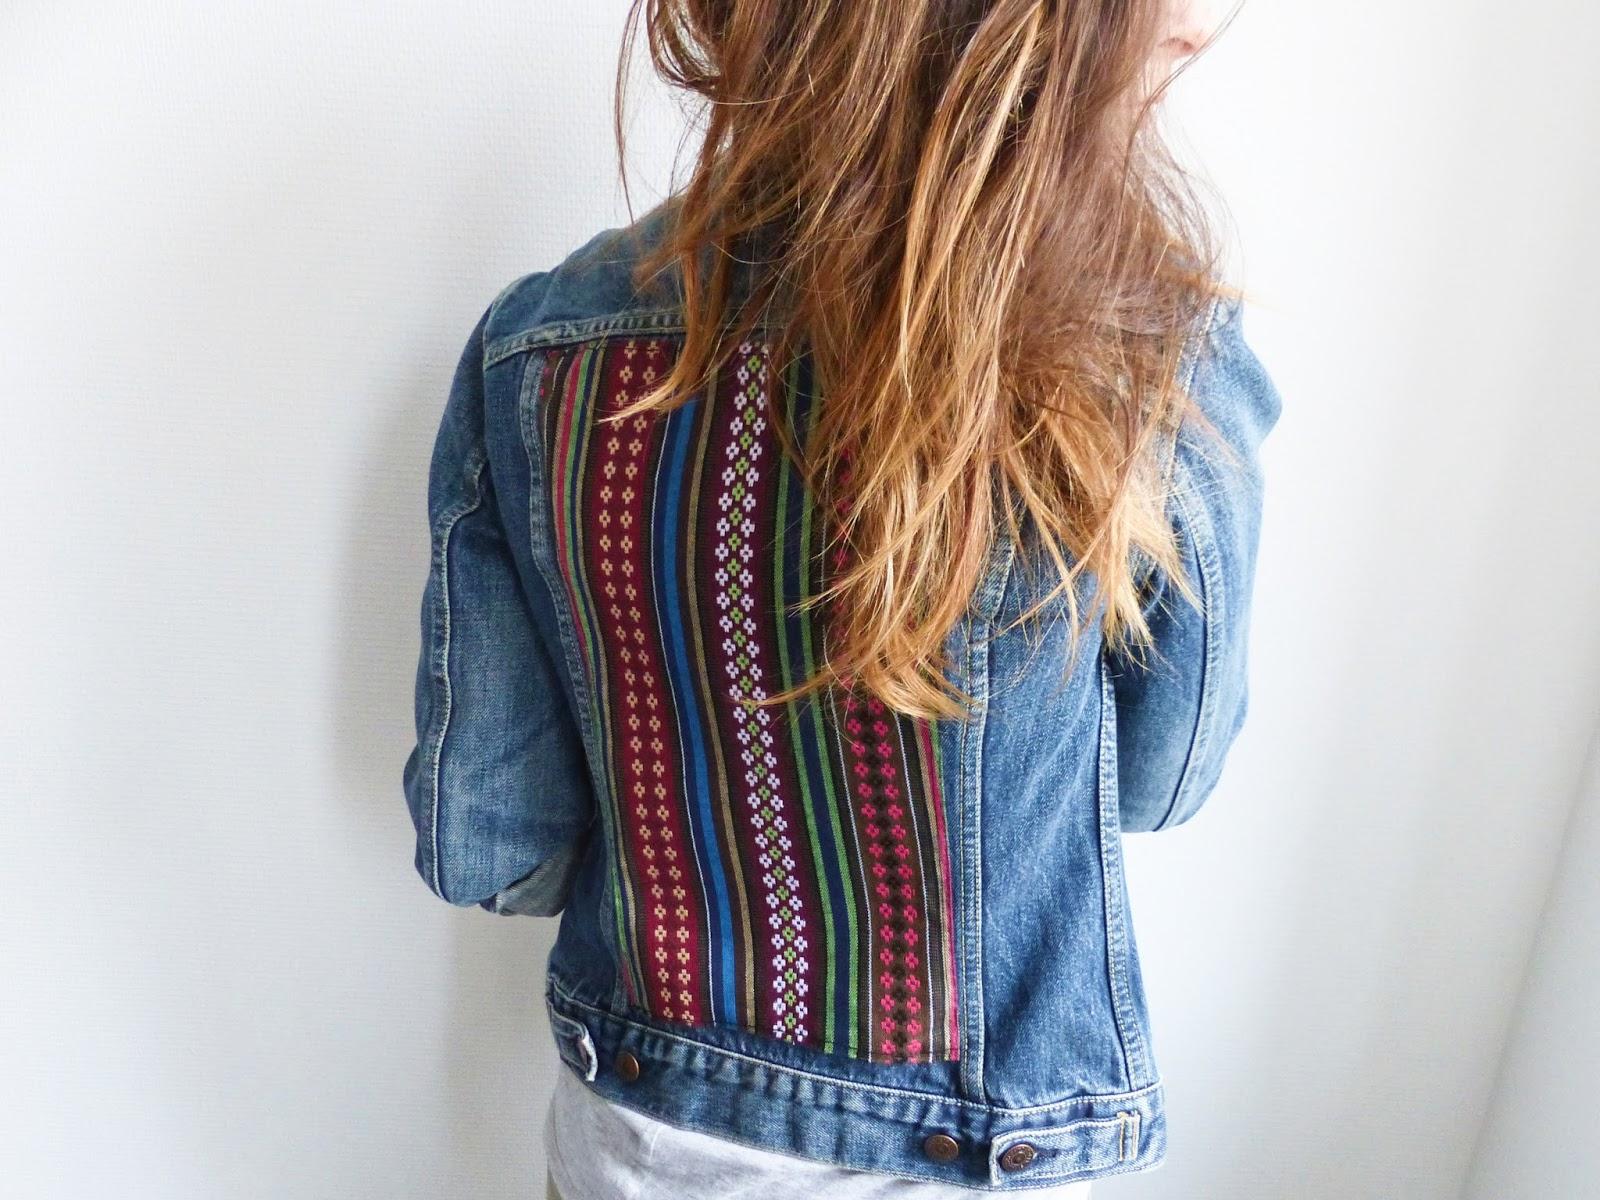 diy veste en jean customis e avec tissu azt que blog diy do it yourself jules coton. Black Bedroom Furniture Sets. Home Design Ideas